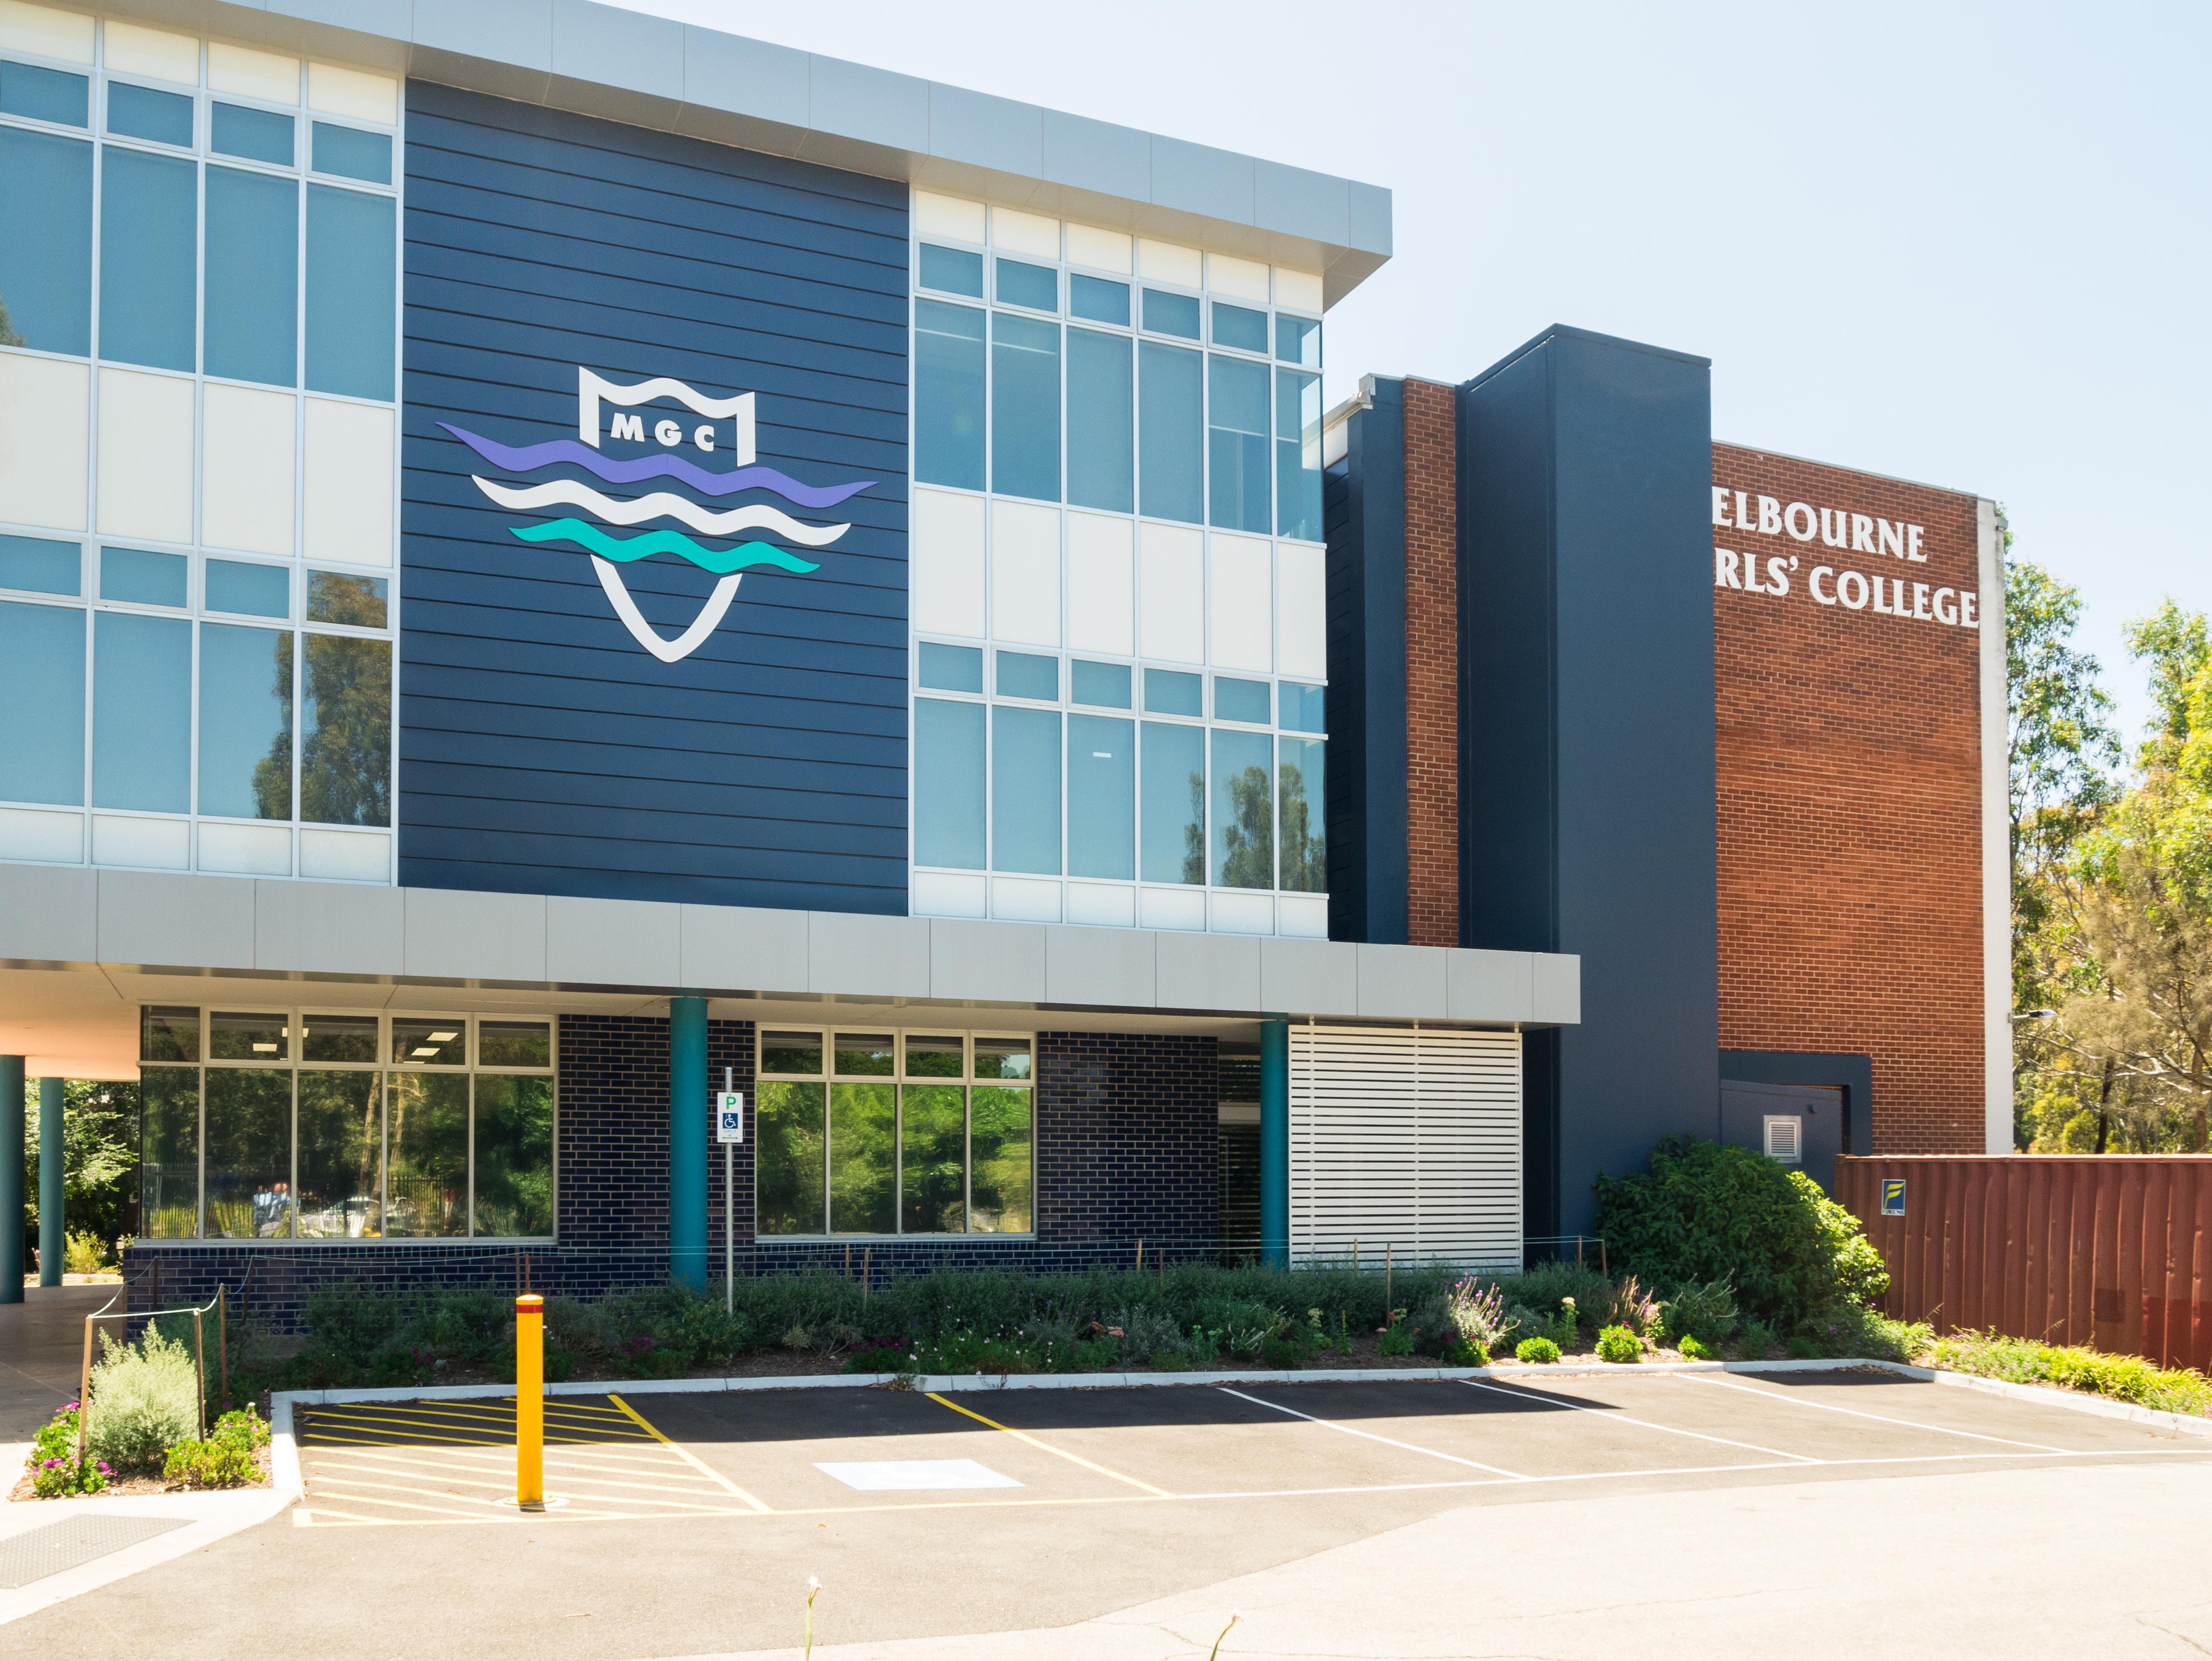 Melbourne Girls College